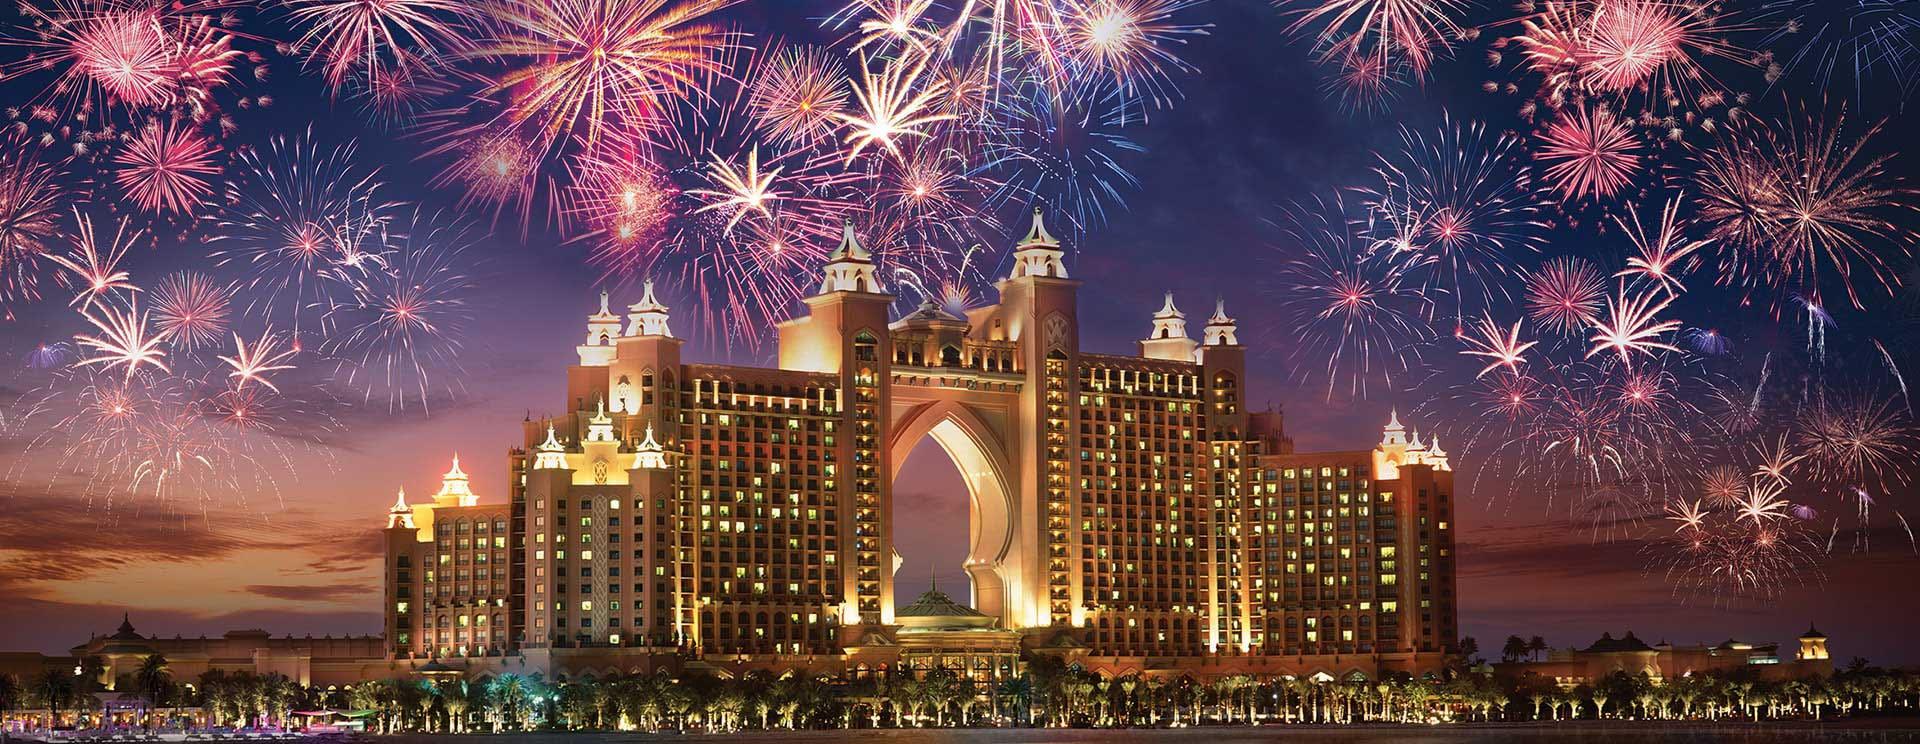 happy new year at burj khalifa 2020